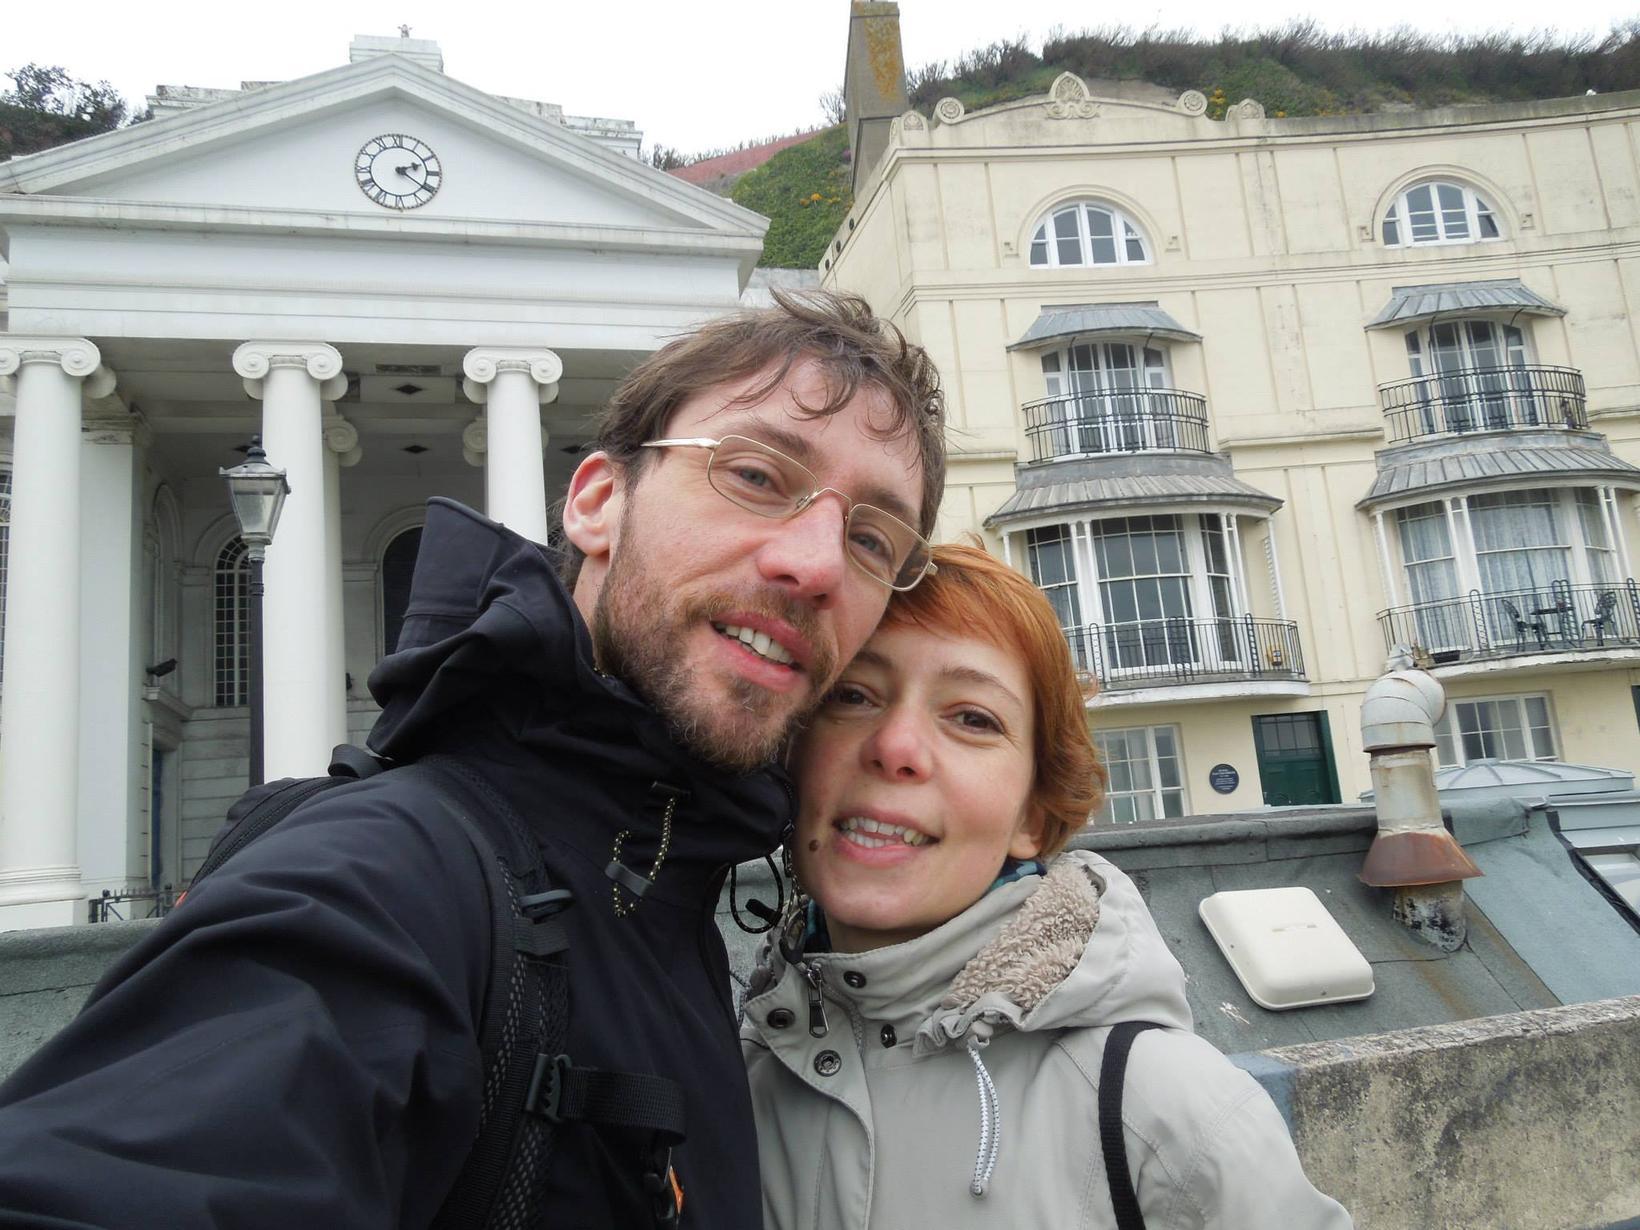 Alexandra & Nicholas from London, United Kingdom